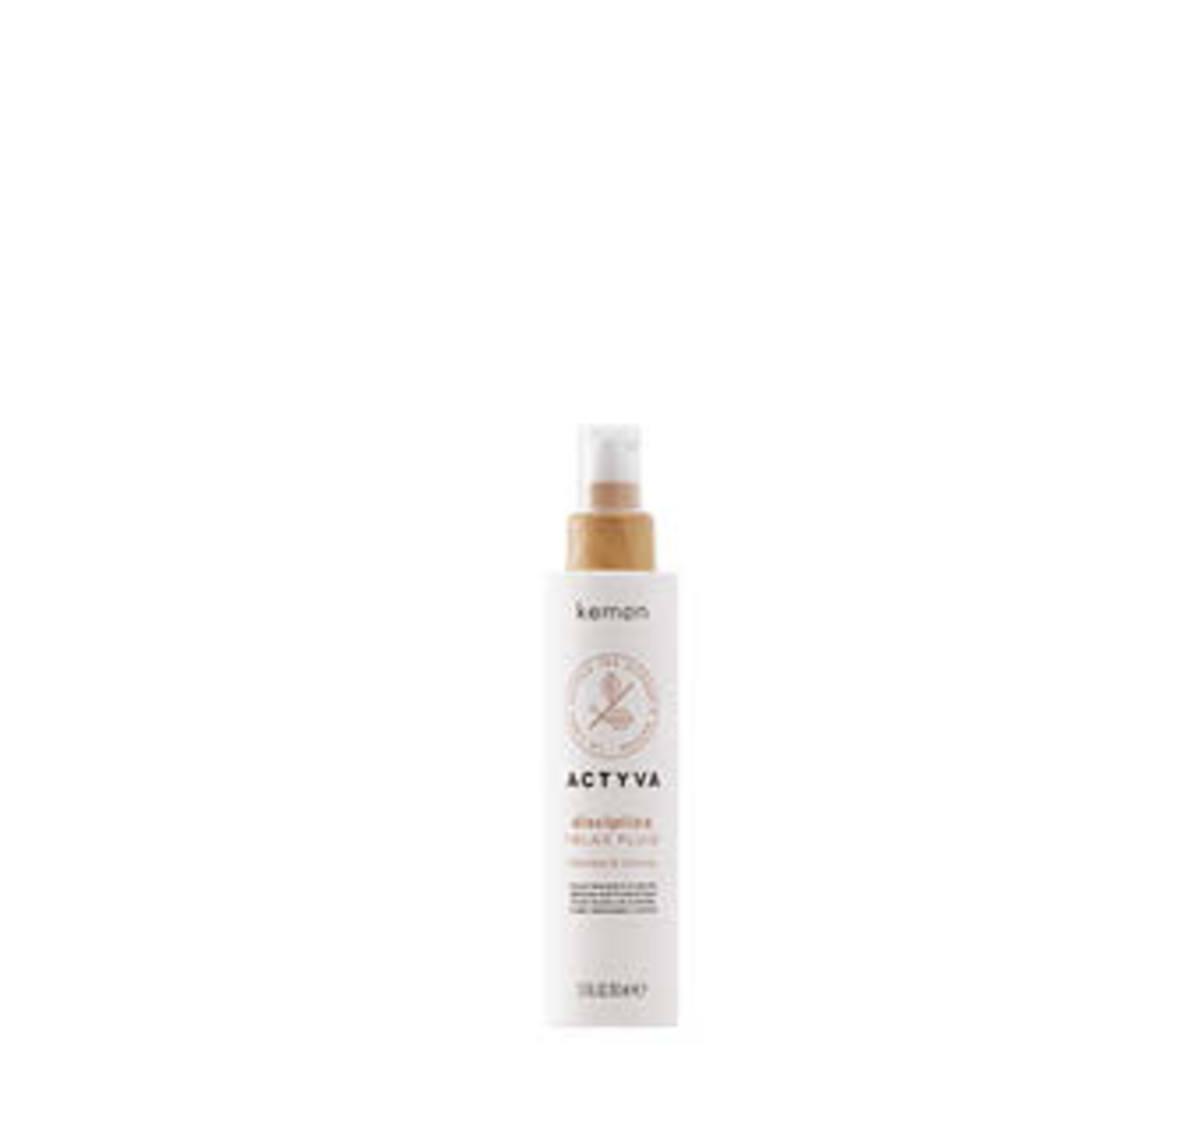 Actyva Disciplina Relax Fluid 150 ML antiencrespamiento cabello liso perfecto